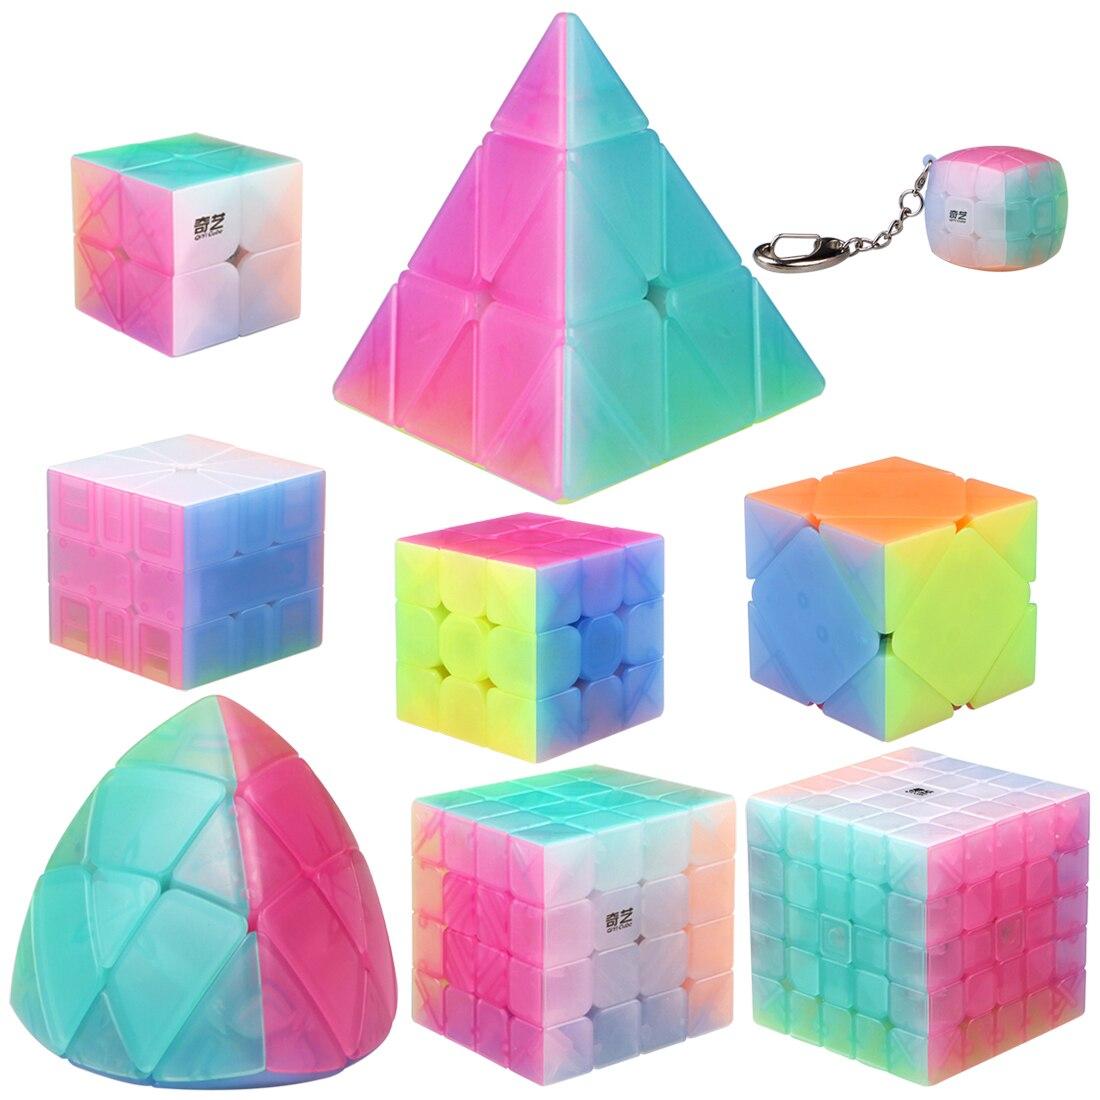 QiYi Gelee Cube Set Einschließlich Pyramide SQ 1 Mastermorphix Qidi S 2x2 Warrior W 3x3 qiYuan S 4x4 Qizheng S 5x5 Zauberwürfel Kits-in Zauberwürfel aus Spielzeug und Hobbys bei  Gruppe 1